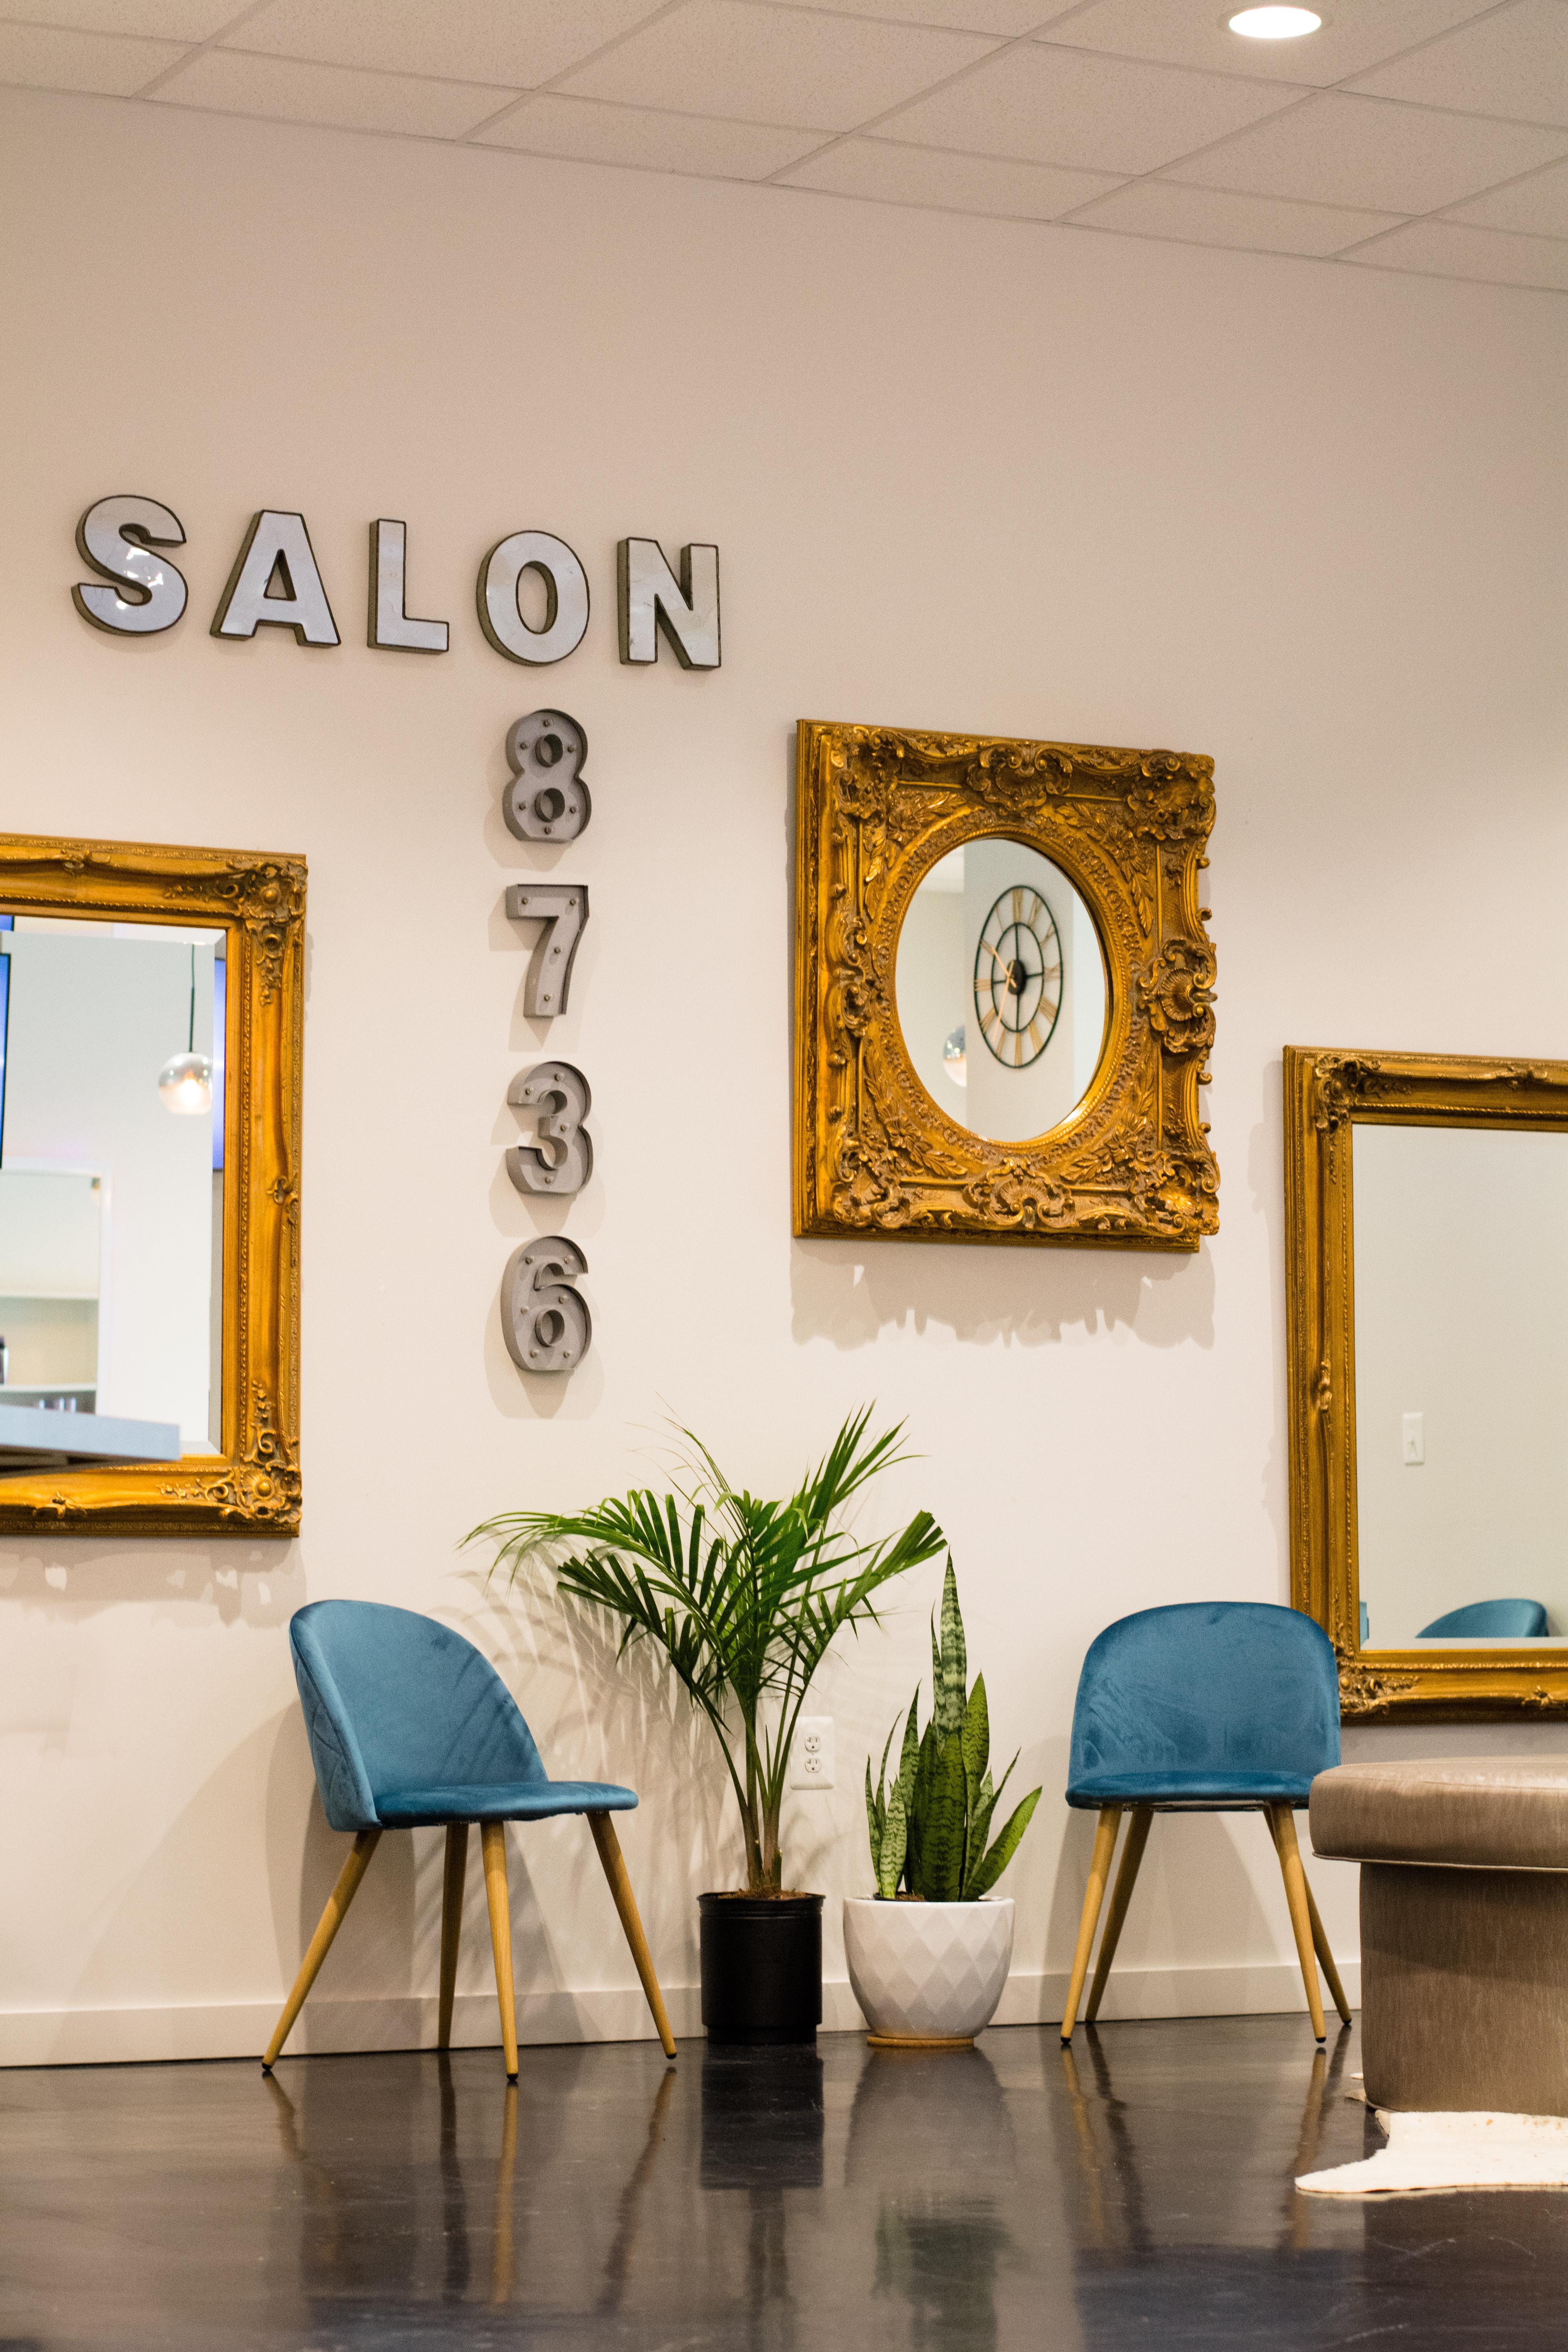 salon8736-1